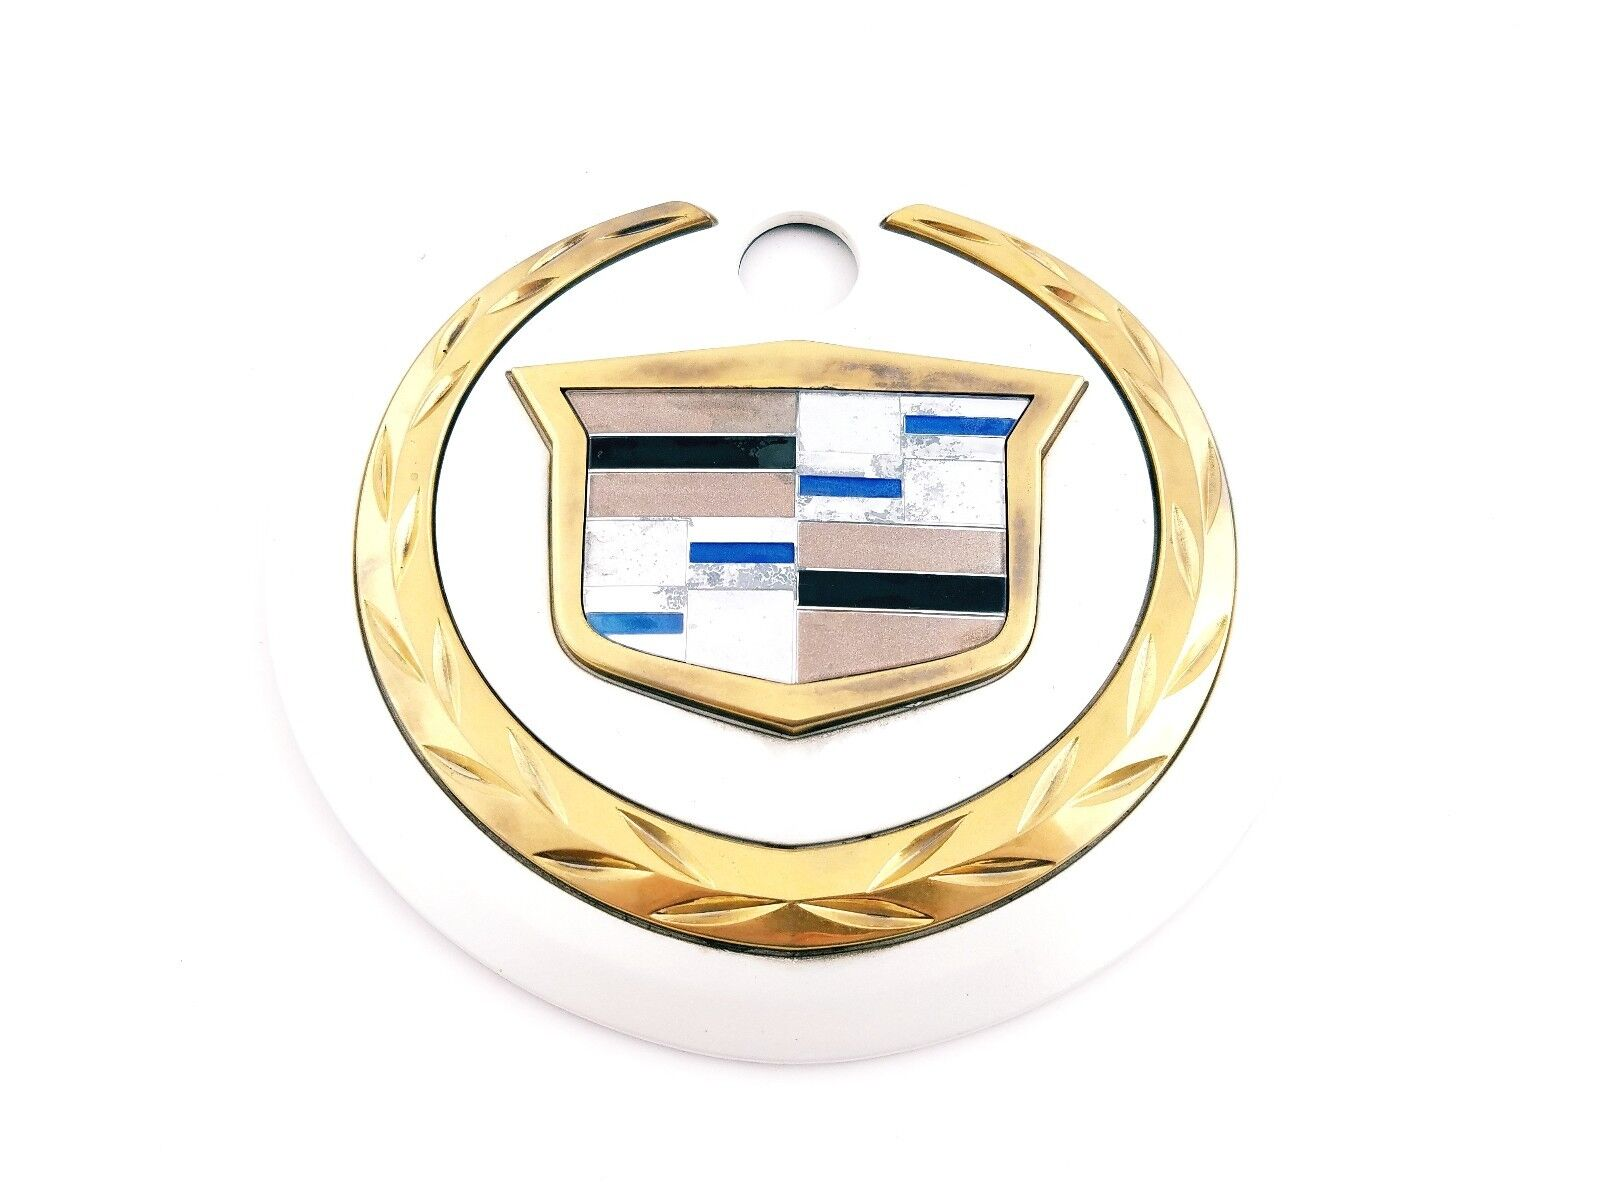 02 03 04 05 06 Cadillac Escalade Escalade Escalade Hinten Deckel Emblem Badge Logo Symbol Sign Oem ae9e6b